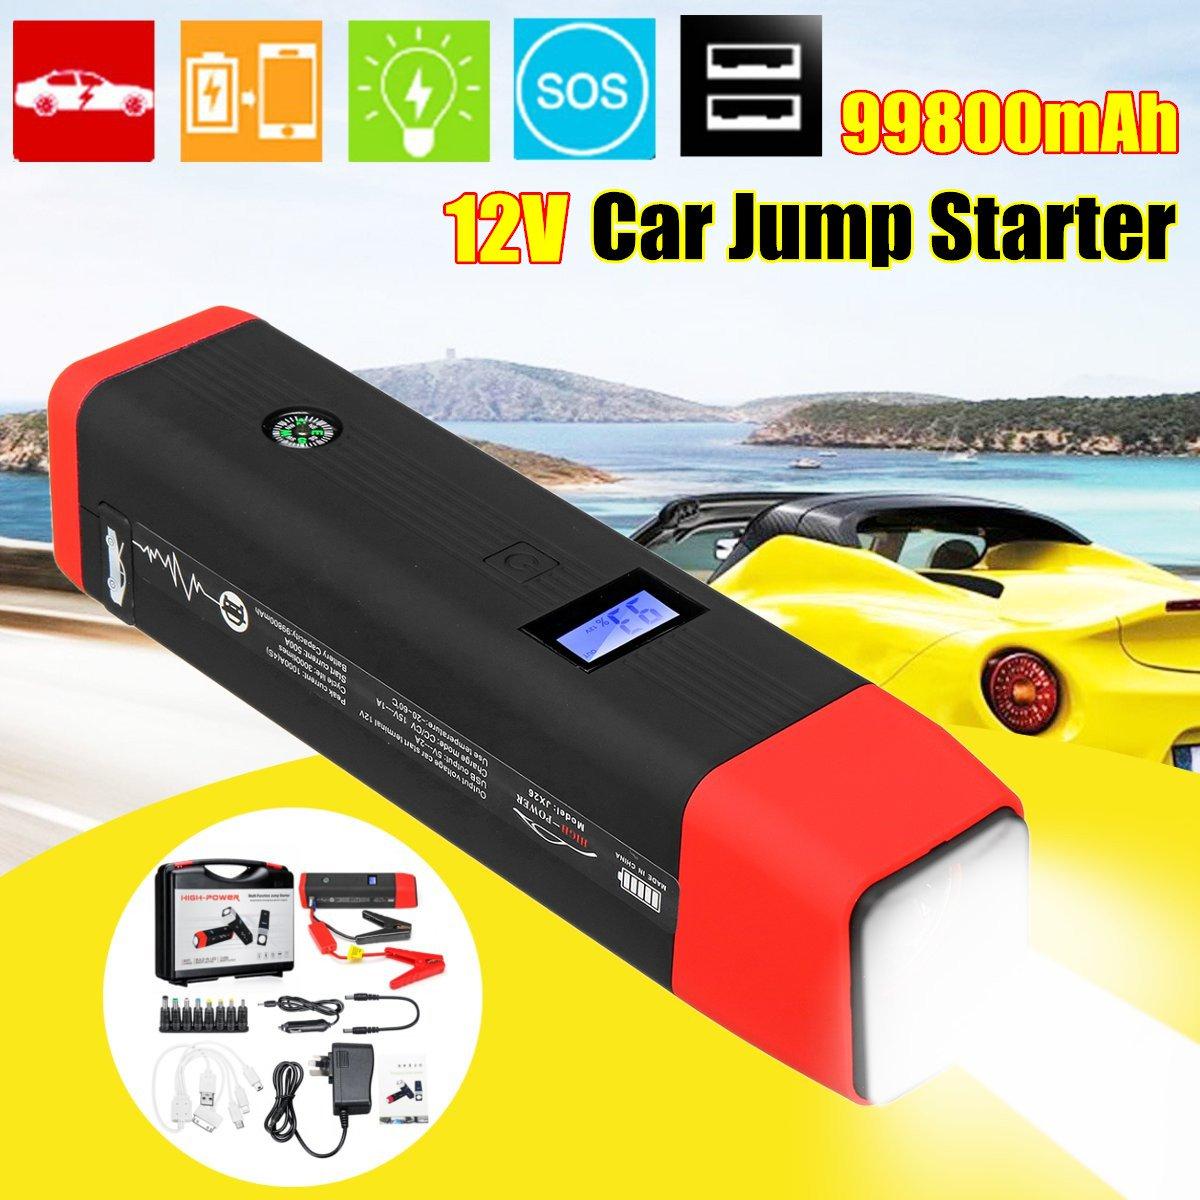 99800mAh 12V 2USB Start Best 1000A Peaks Current Car Jump Starter Starting Power Bank Auto Battery Portable Pack Booster